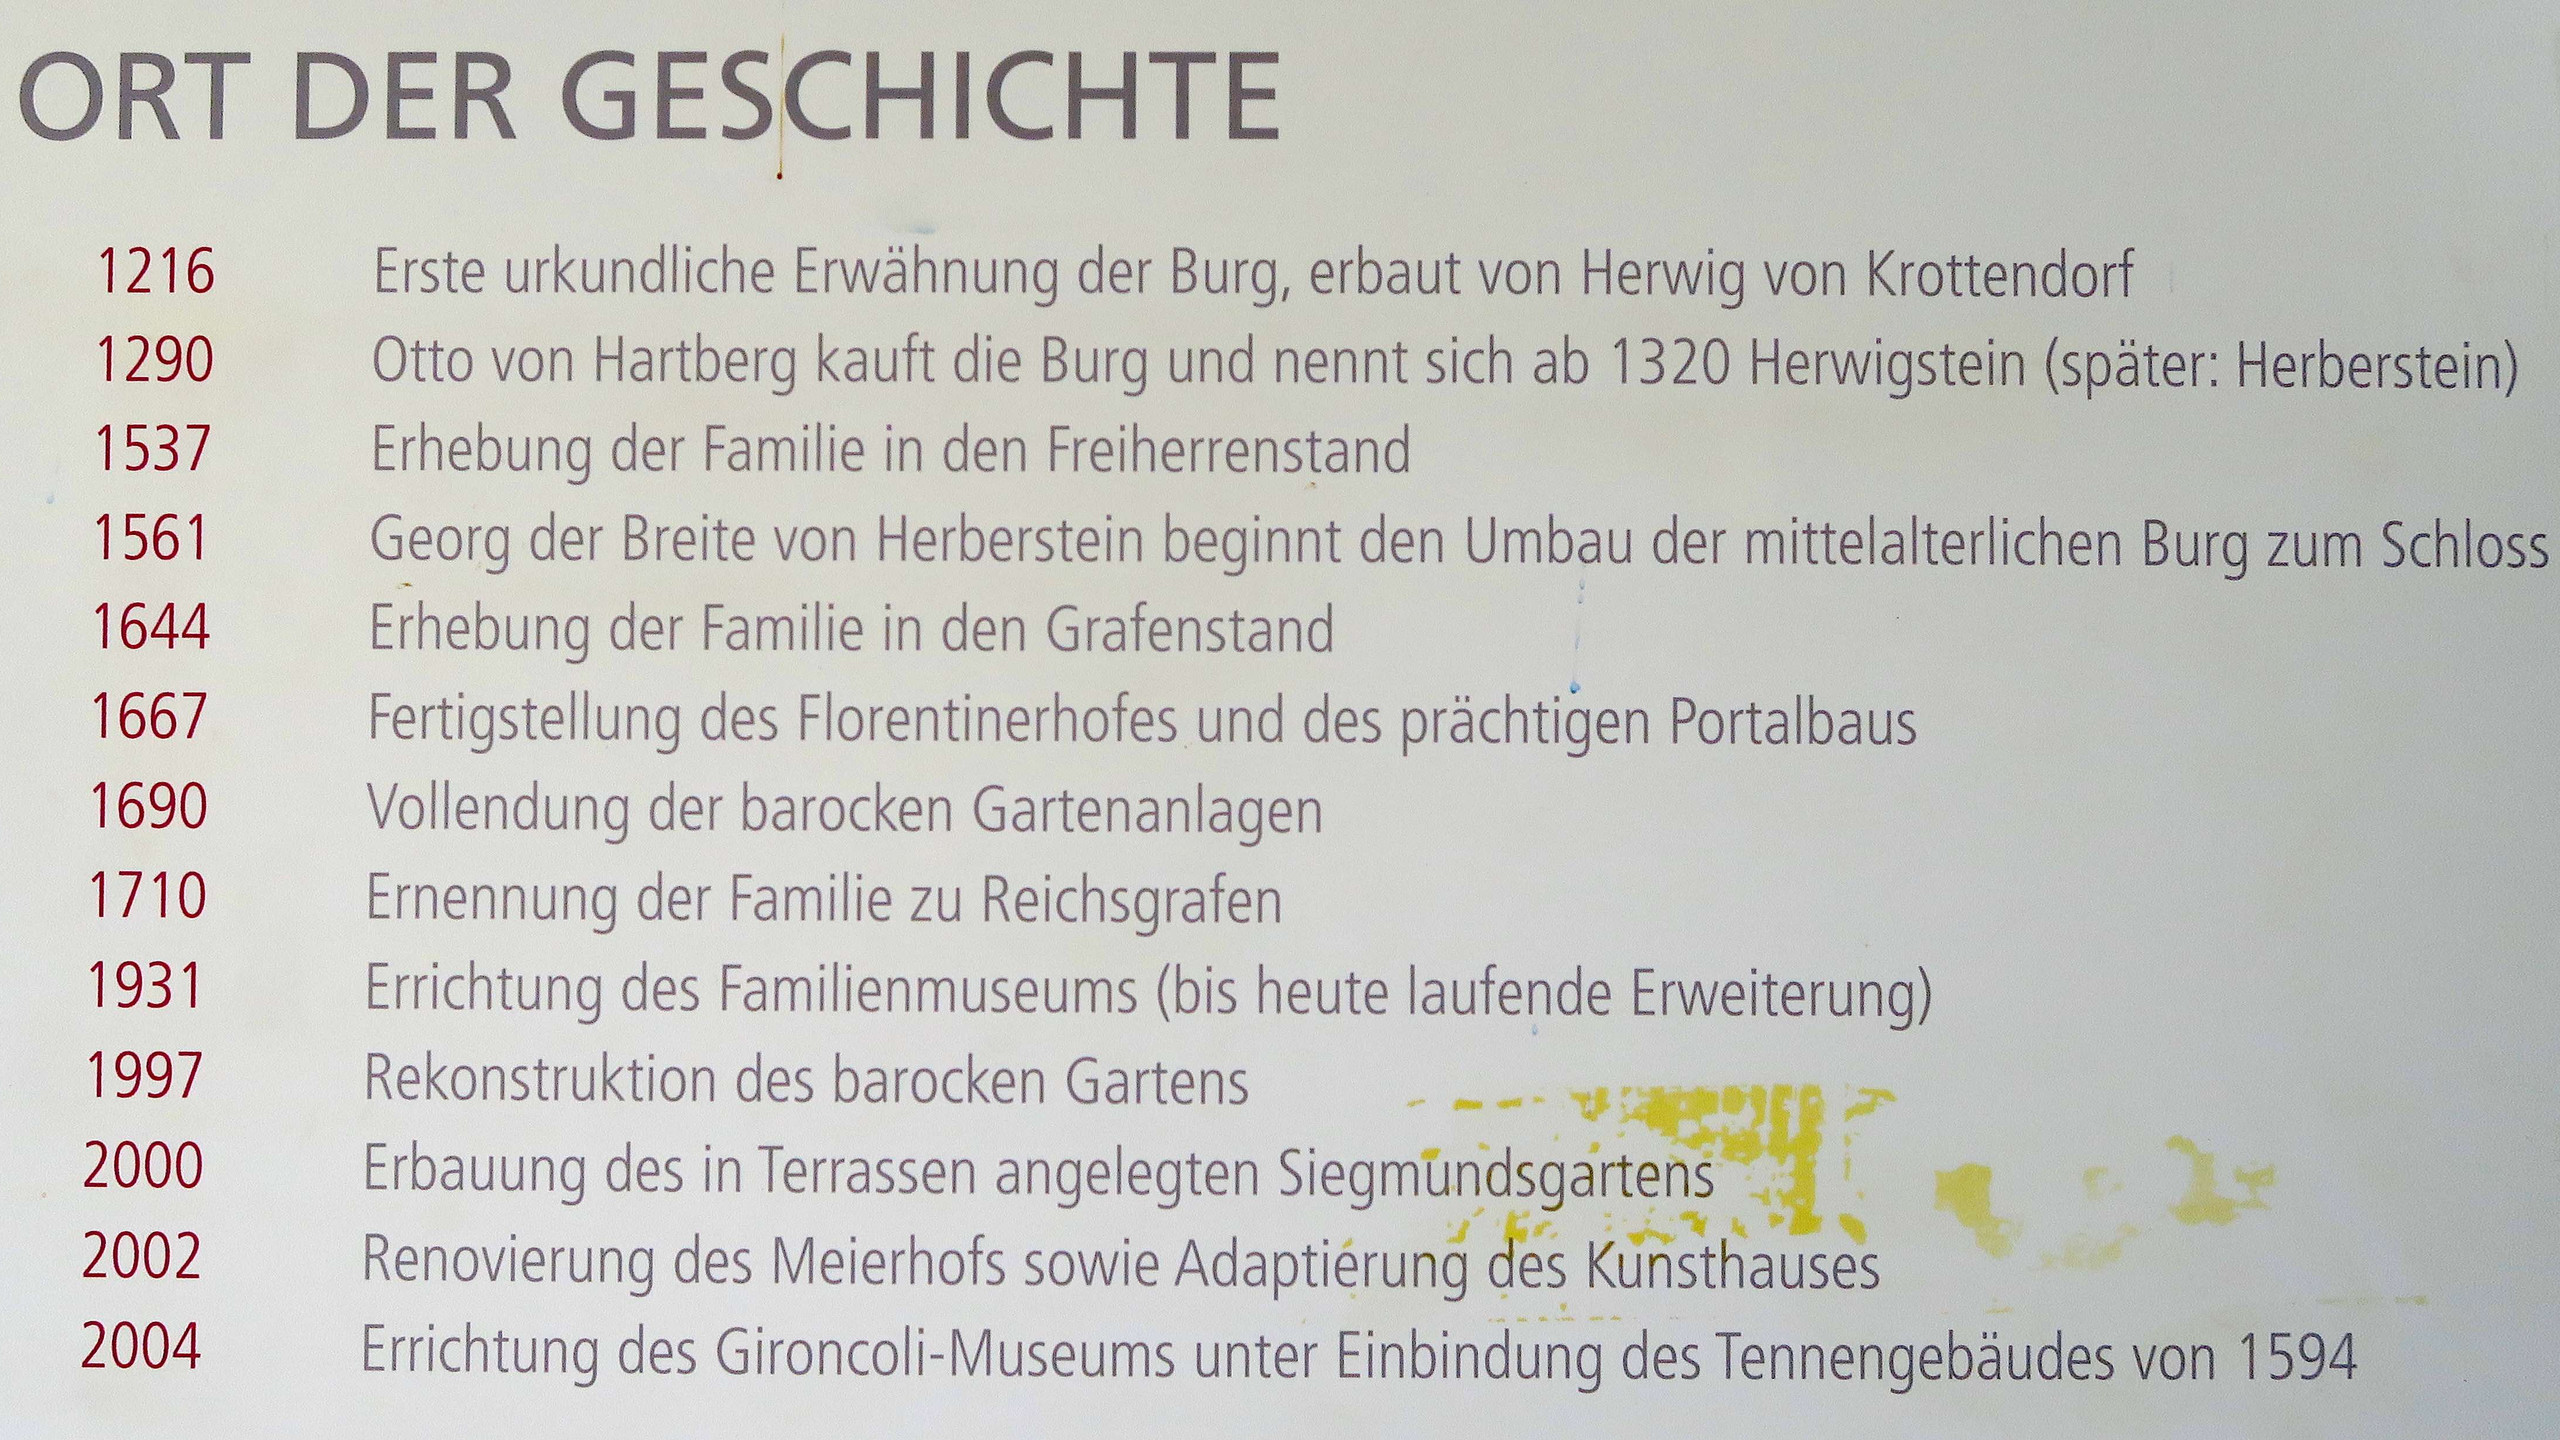 IMG_1637 Schloss Herberstein Austria 2017 Wilhelm W. Kohl kopie